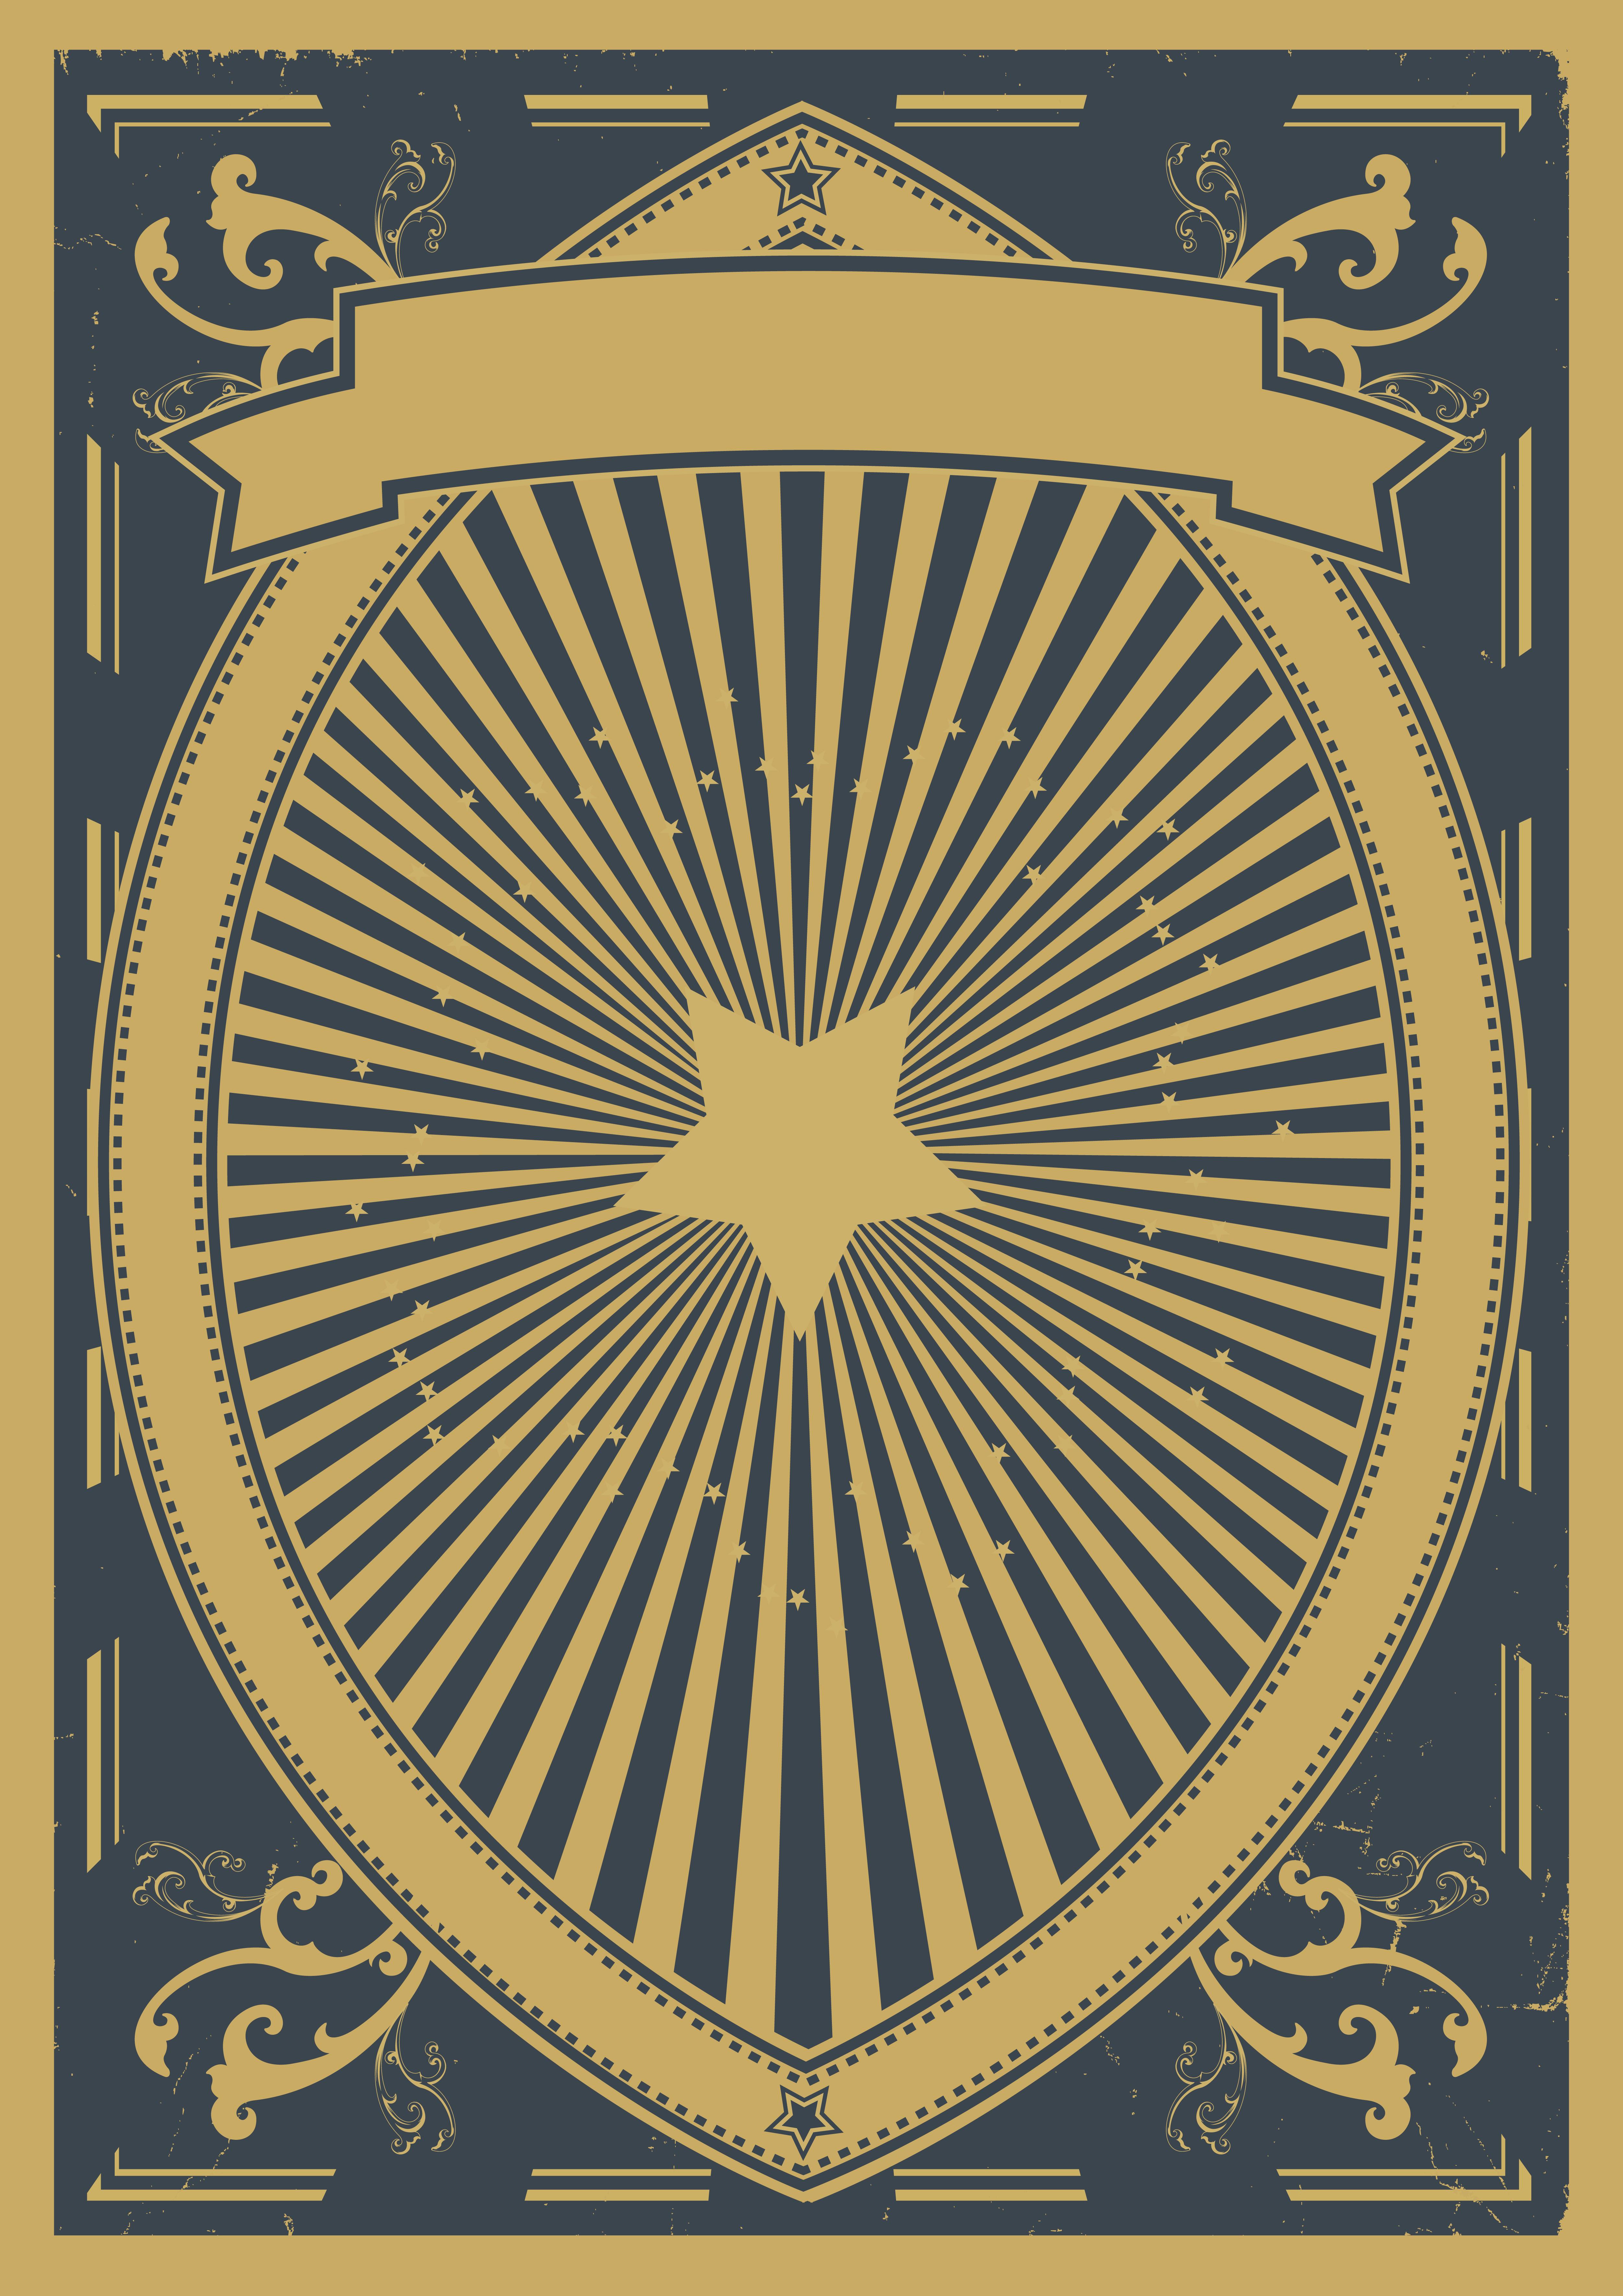 Vintage Retro Poster Background 263318 - Download Free ...